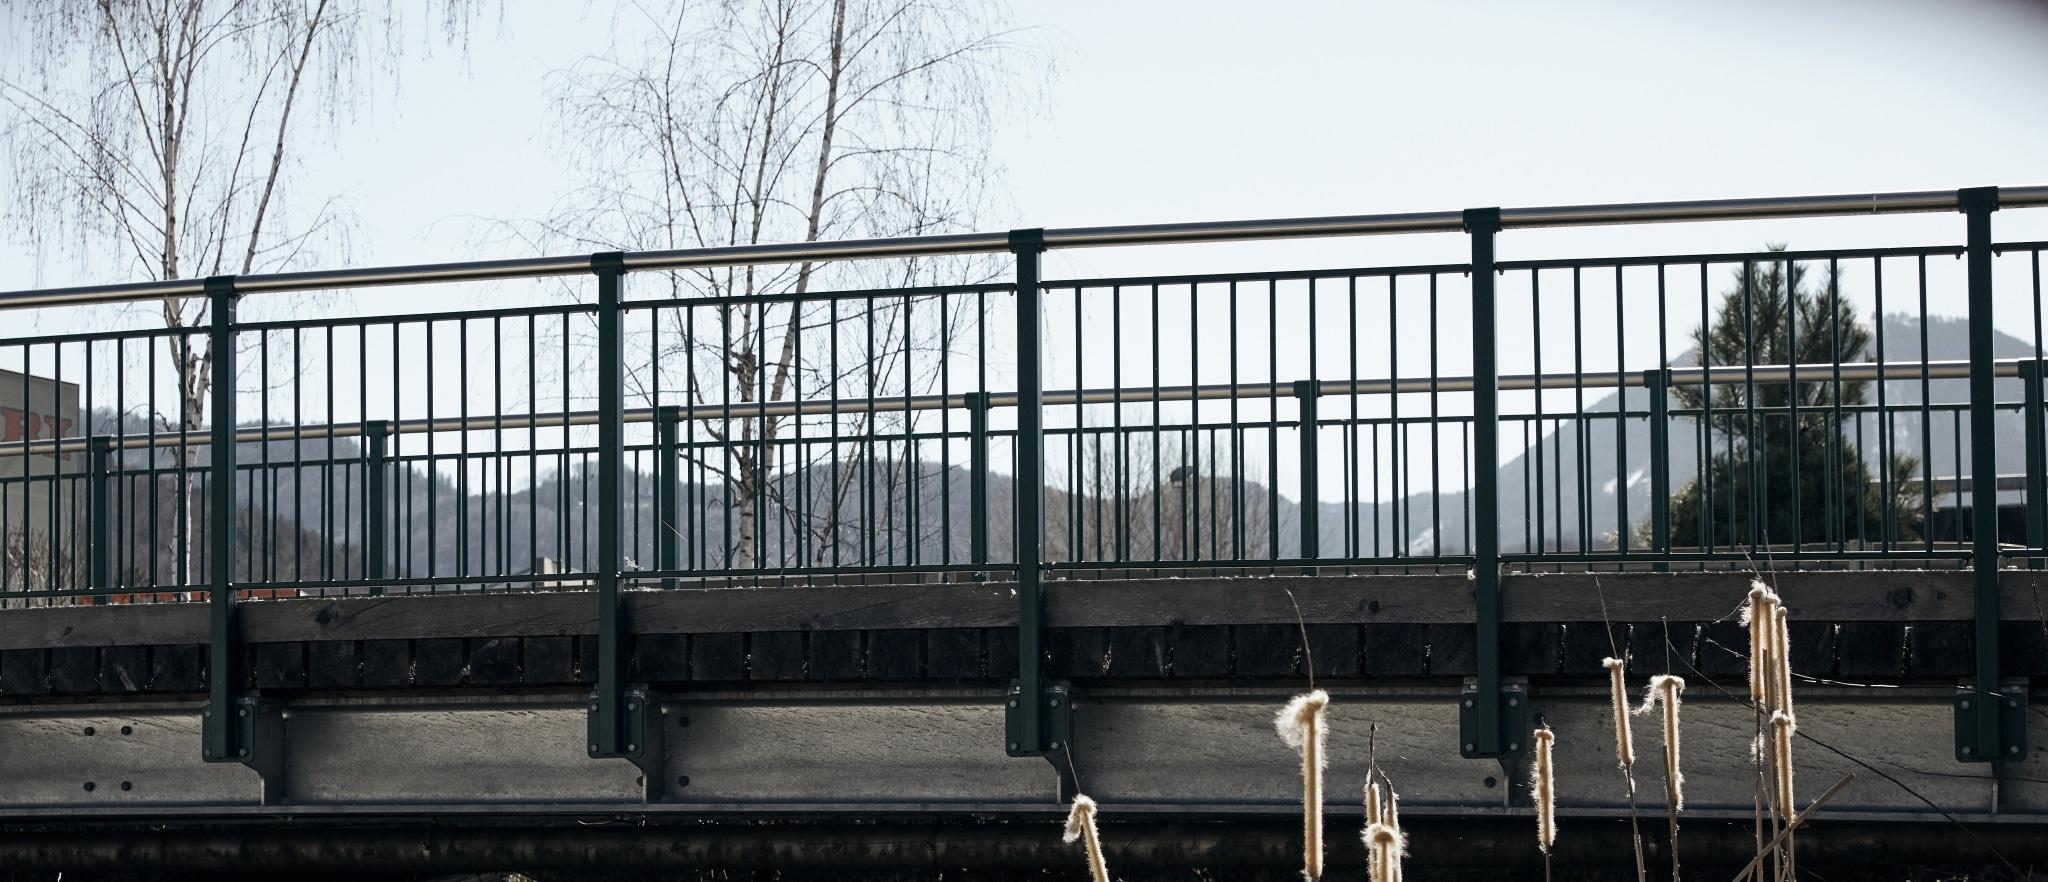 Asen Stahlbau u. Metalltechnik GmbH